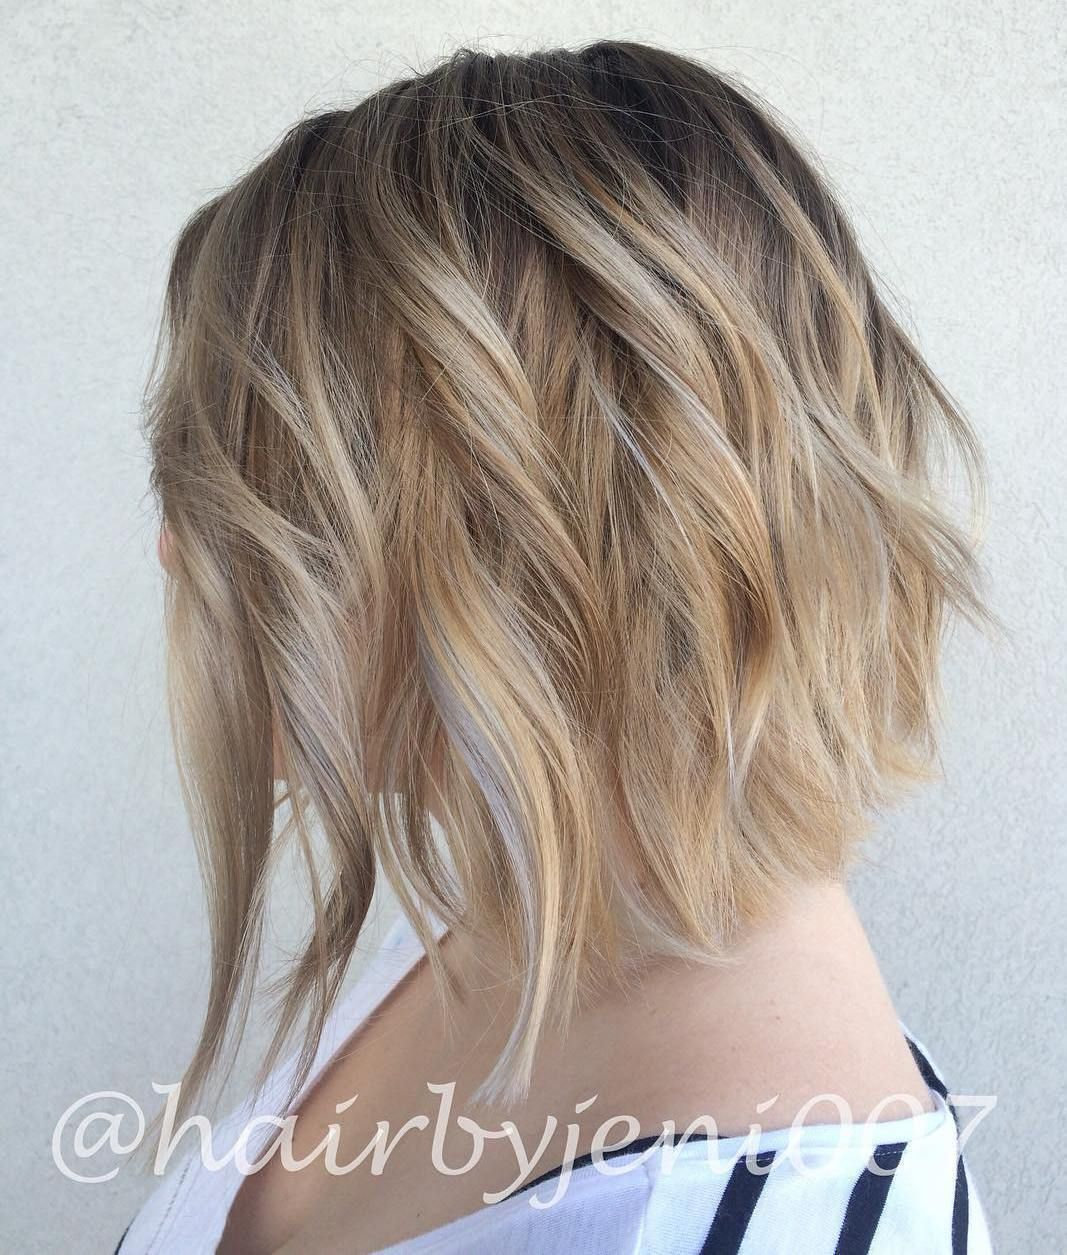 70 Darn Cool Medium Length Hairstyles for Thin Hair | Pinterest ...